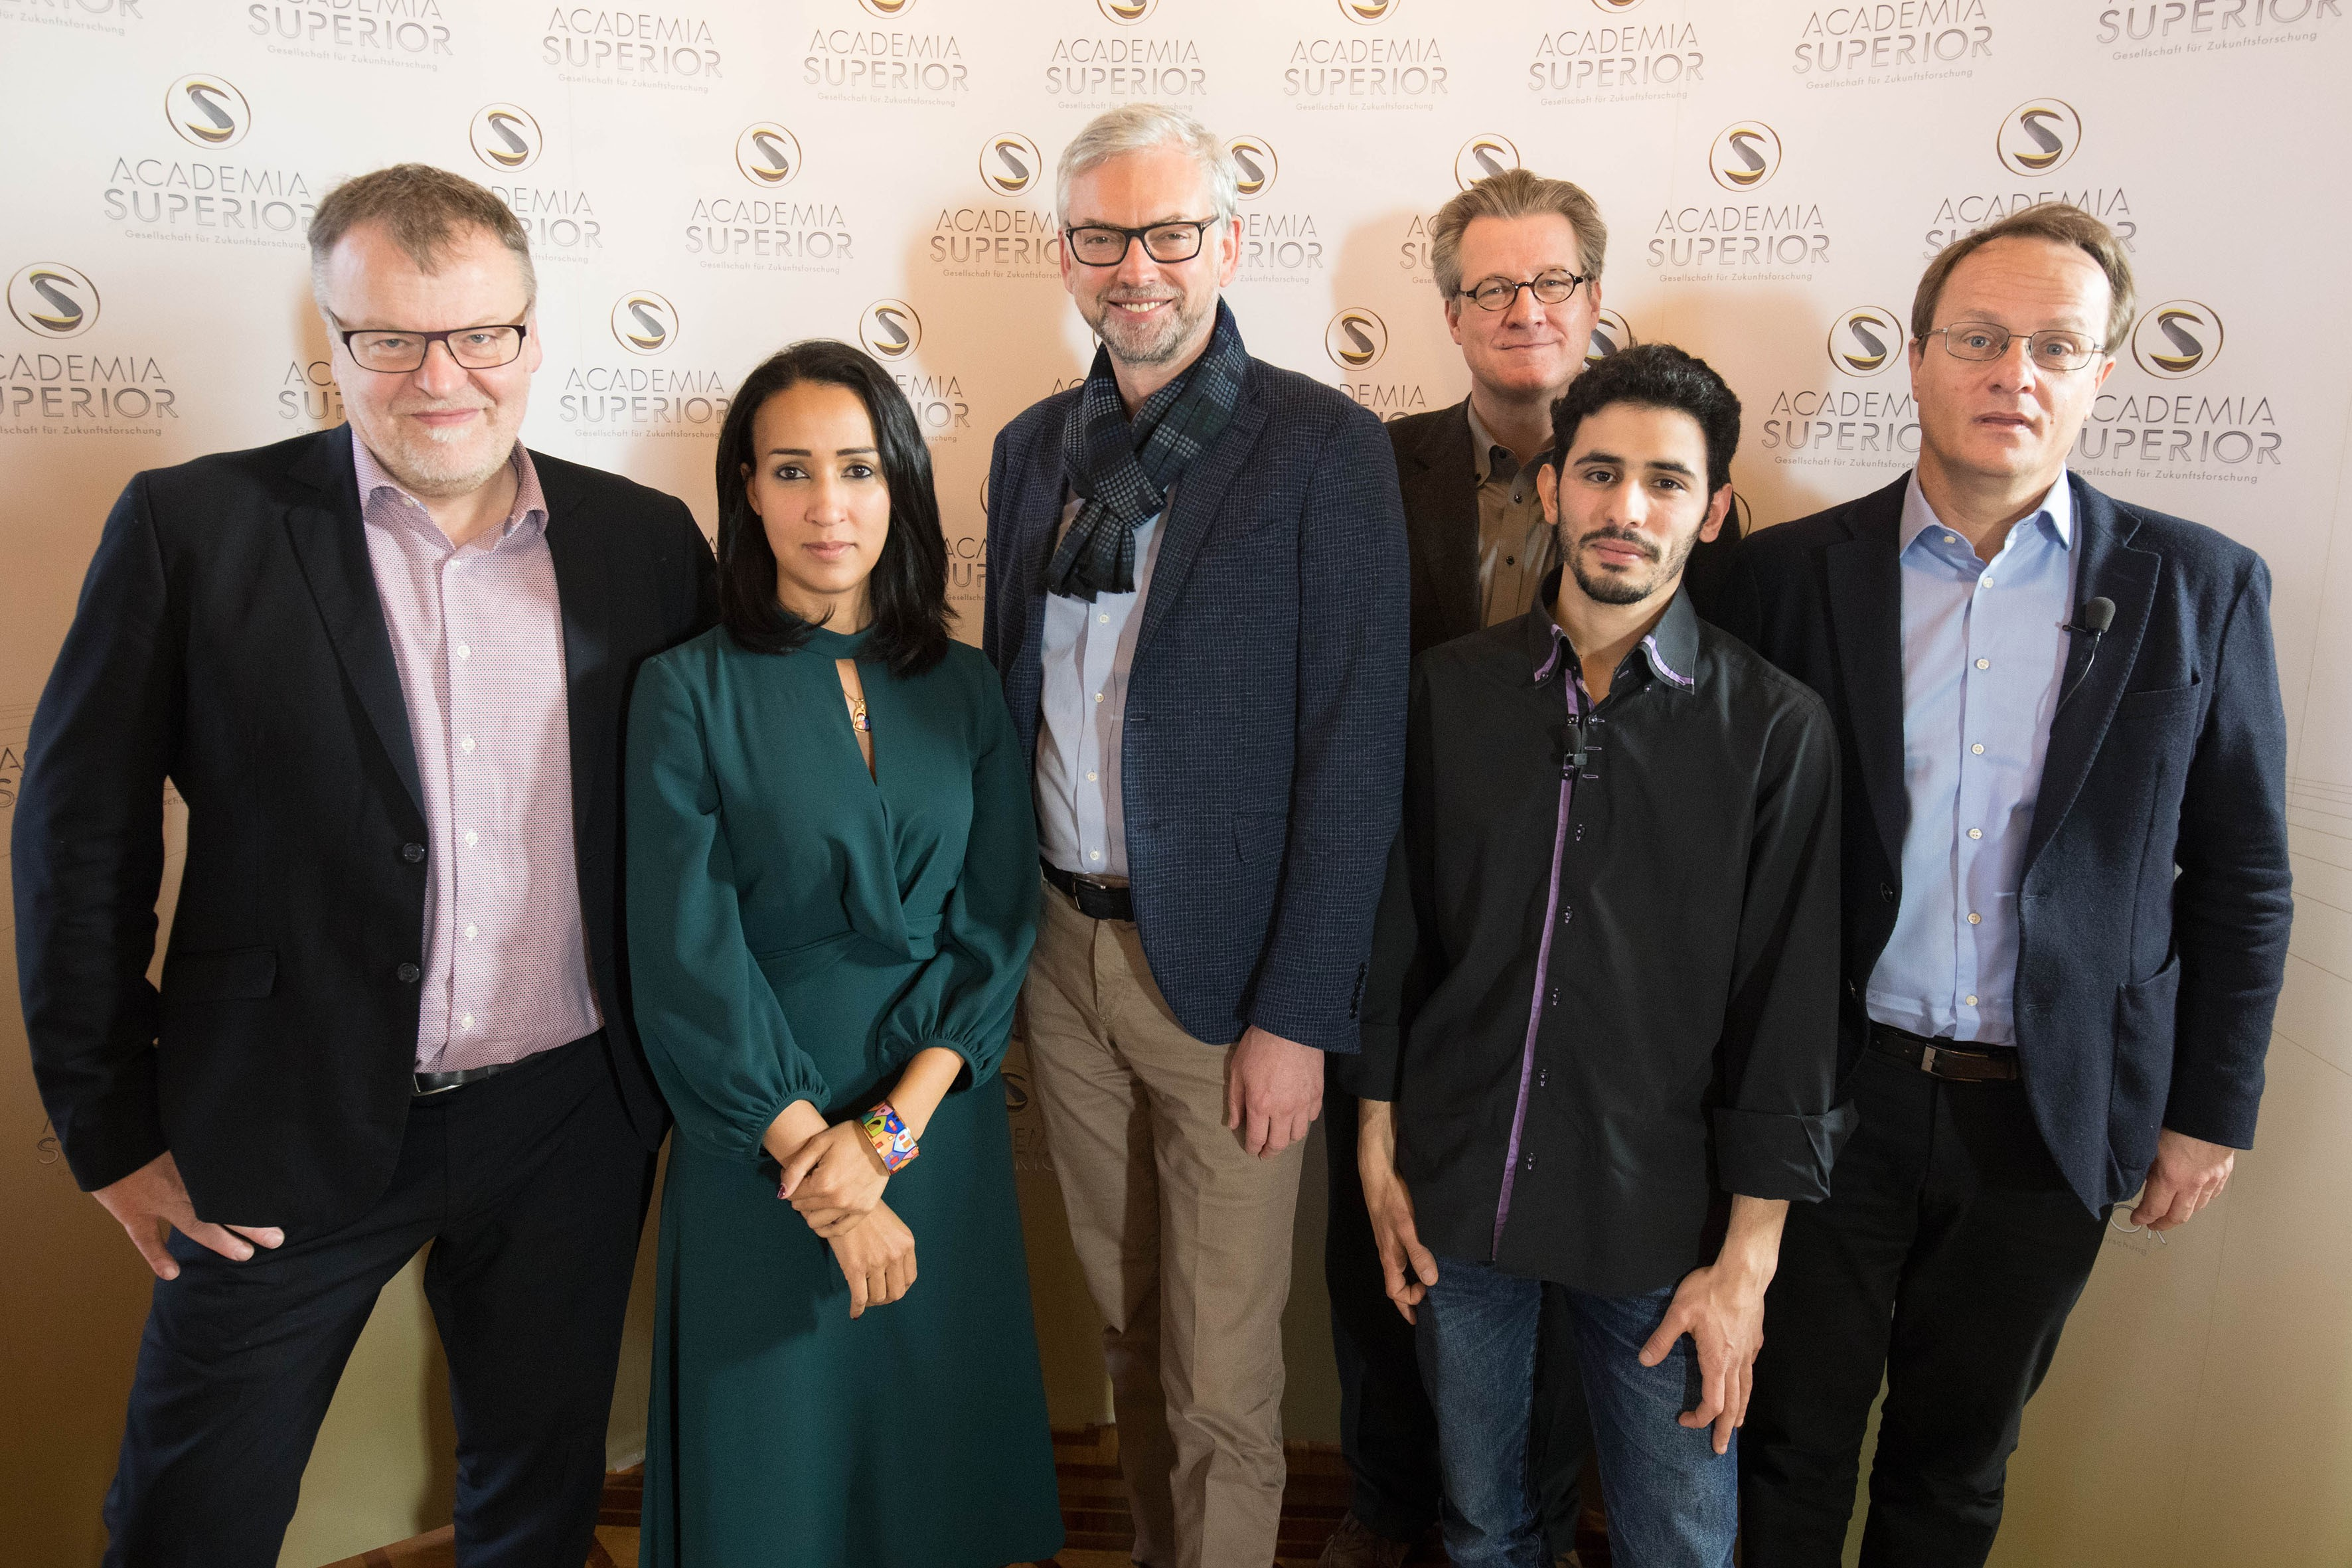 Stefan Ruzowitzky, Manal al-Sharif, Michael Strugl, Philipp Blom, Aeham Ahmad, Markus Hengstschläger